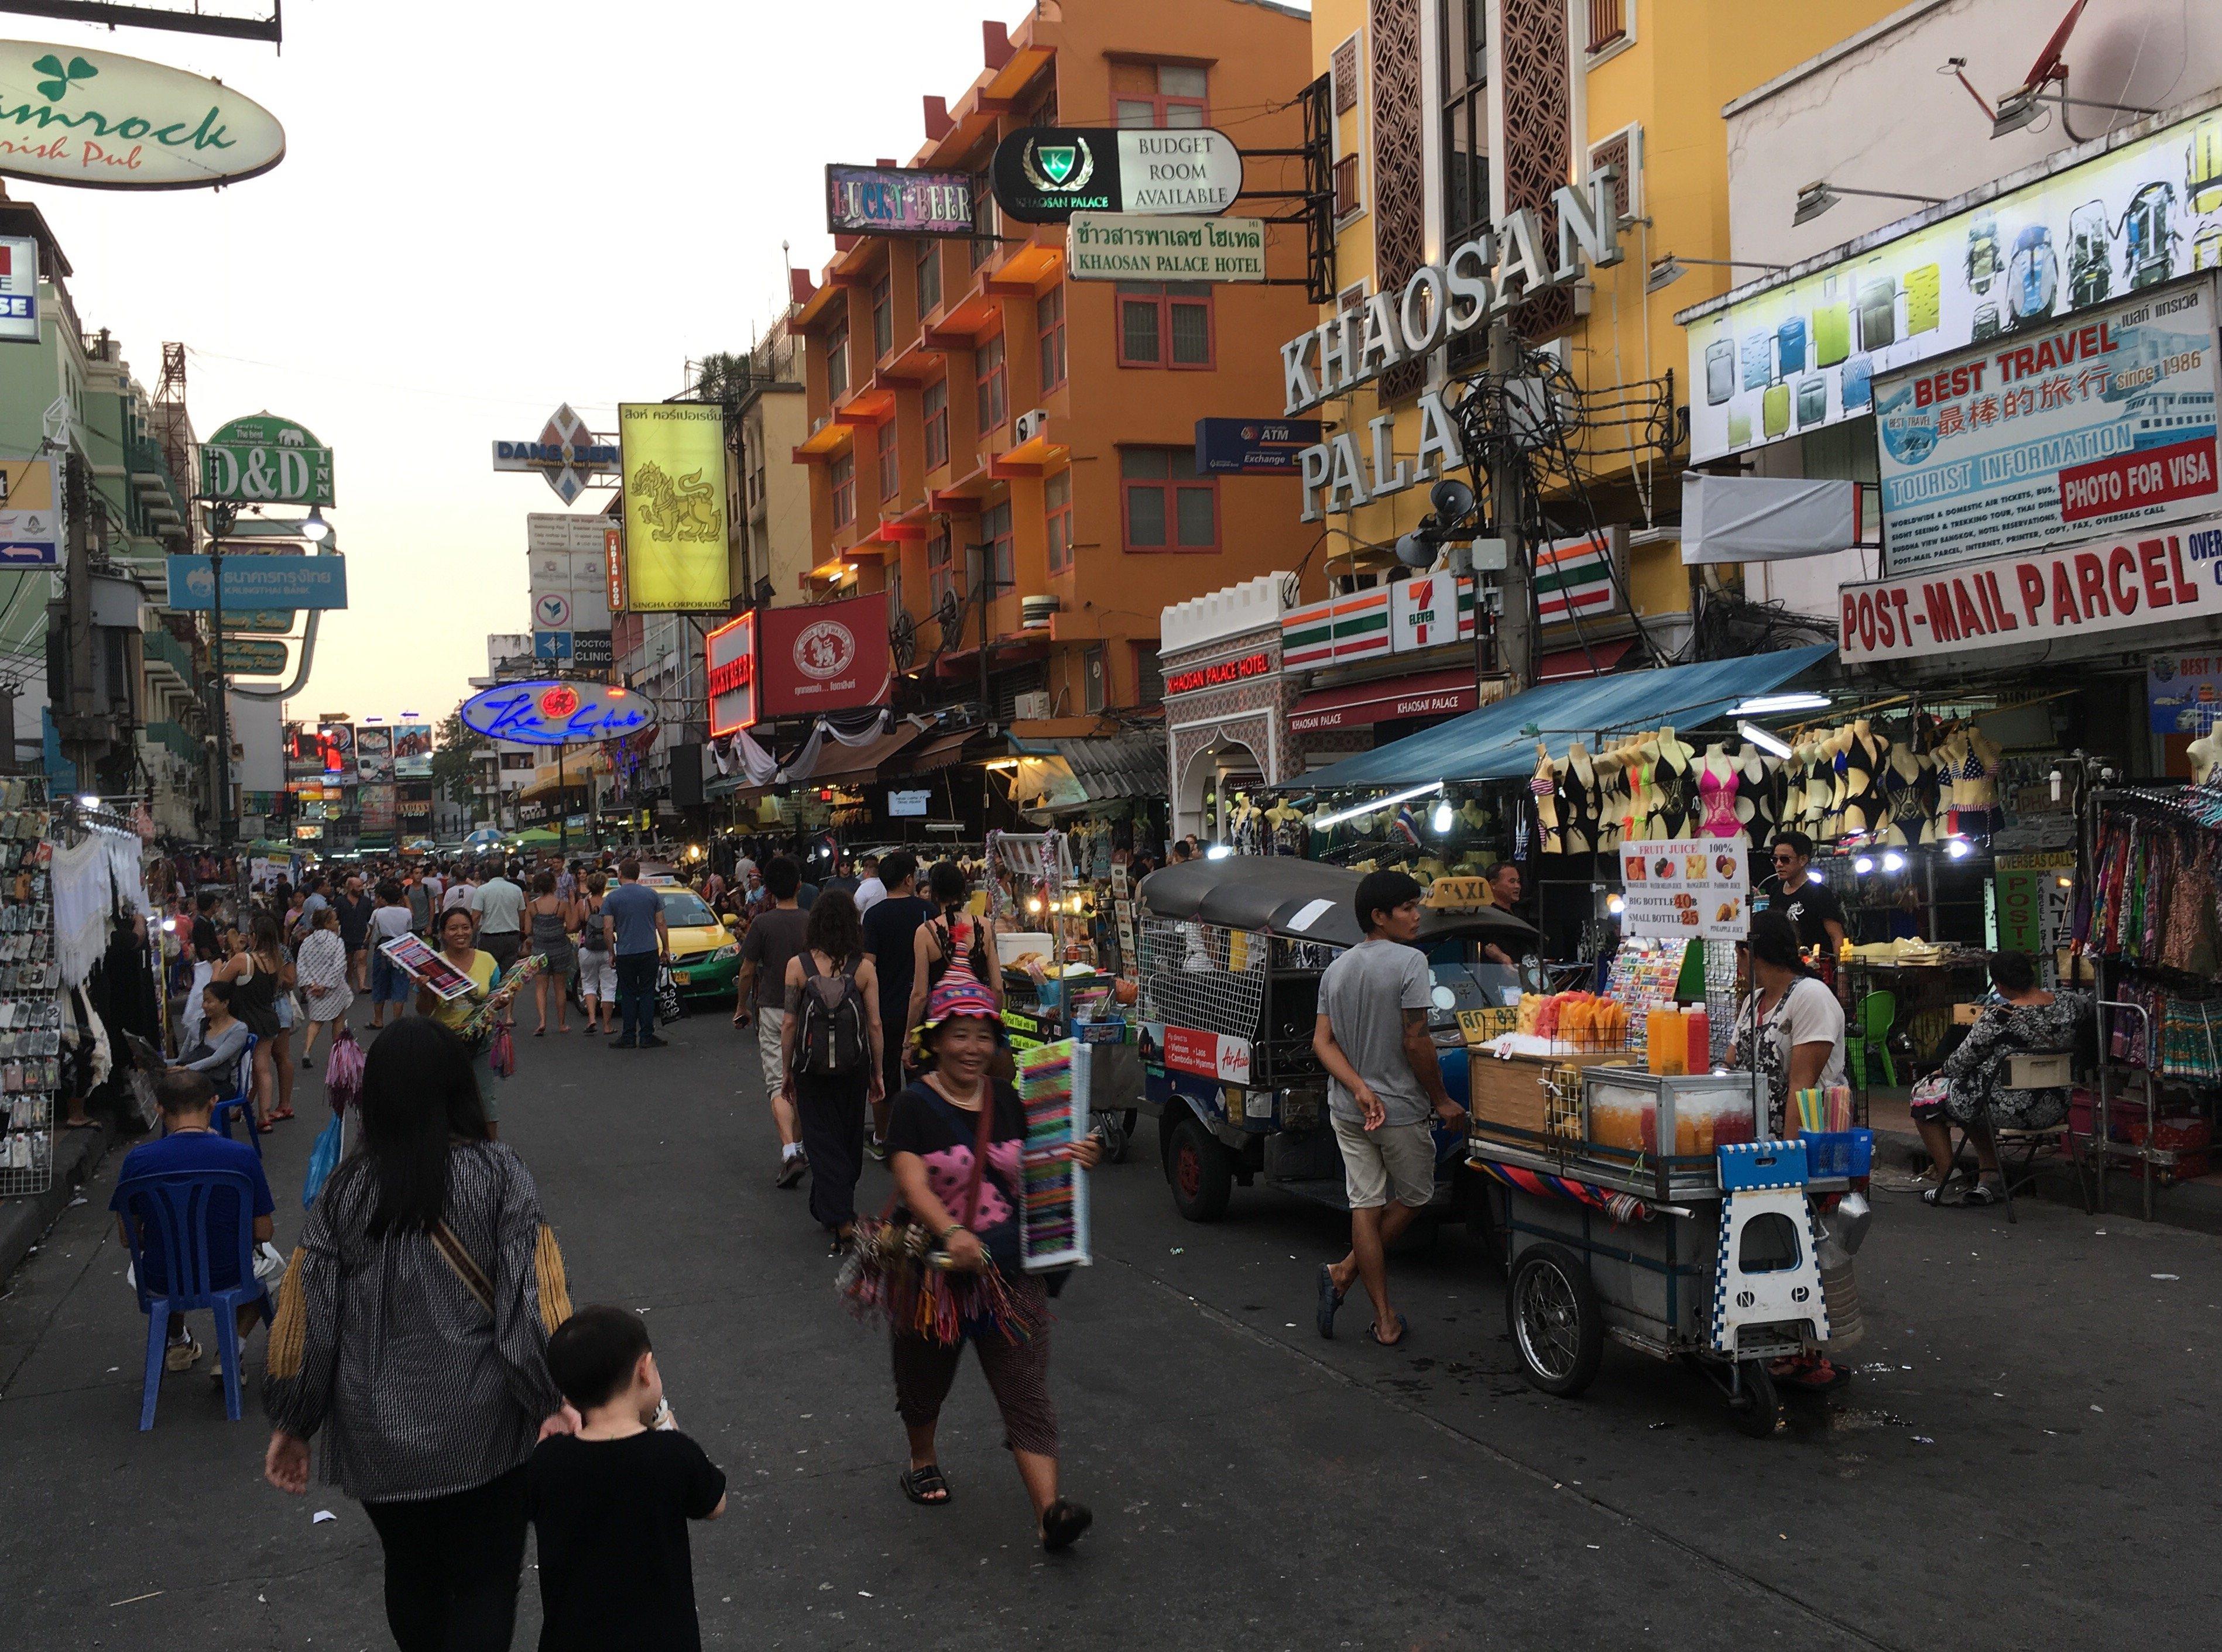 Blog Denise: Ik ga terug naar Thailand!